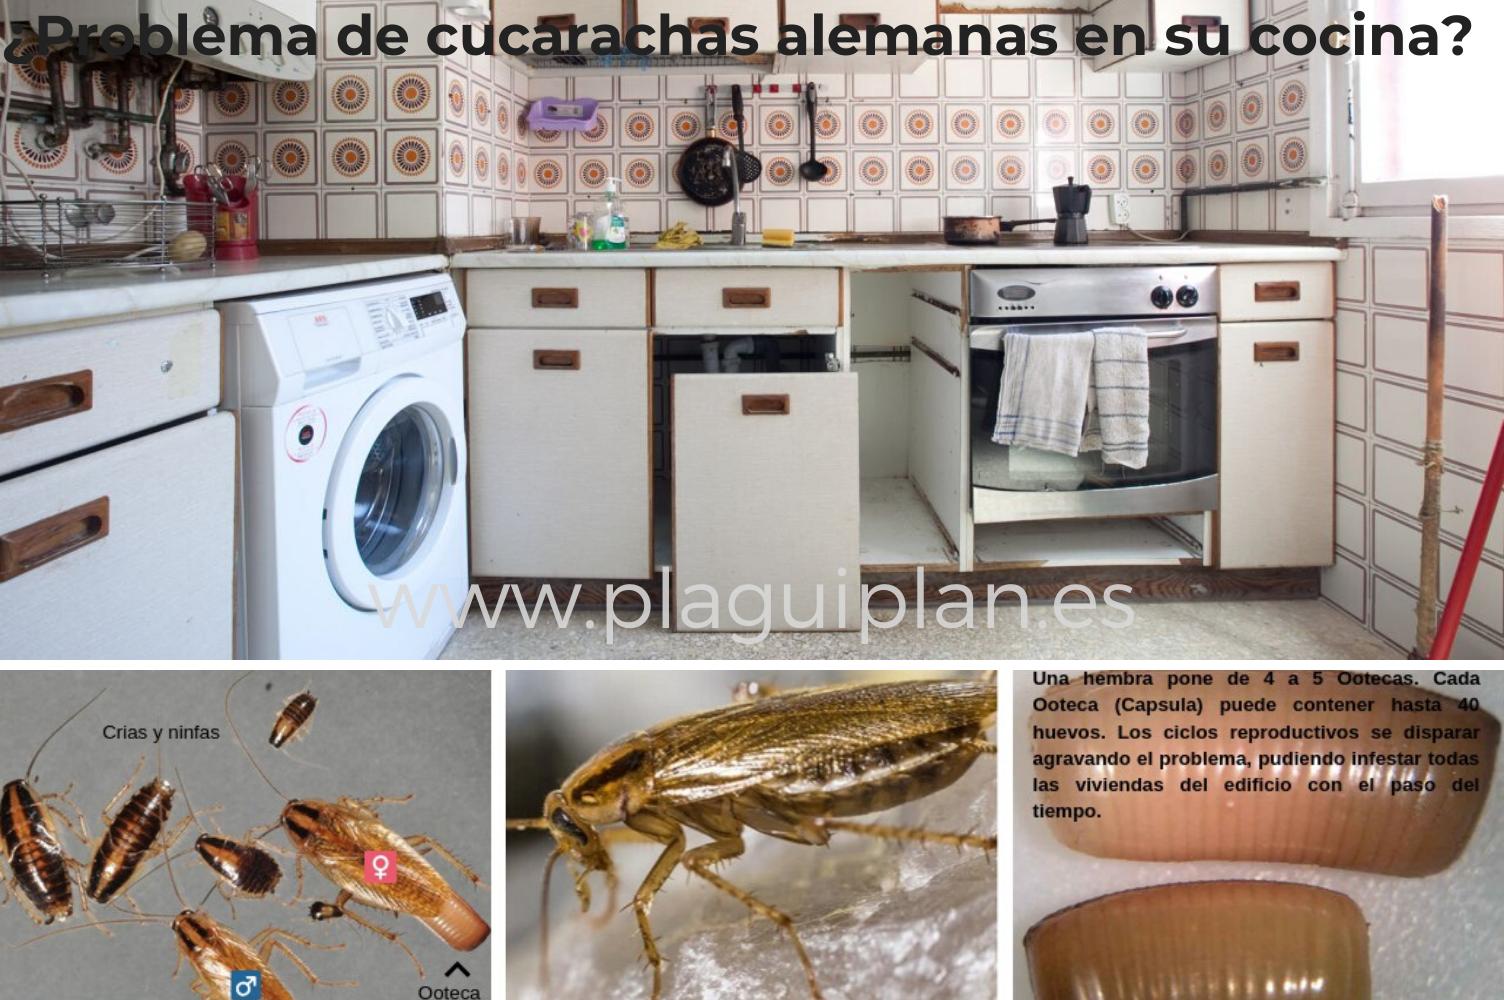 Como Acabar Con La Plaga De Cucarachas Chiquitas Problema De Cucarachas Alemanas En Casa En 2020 Control De